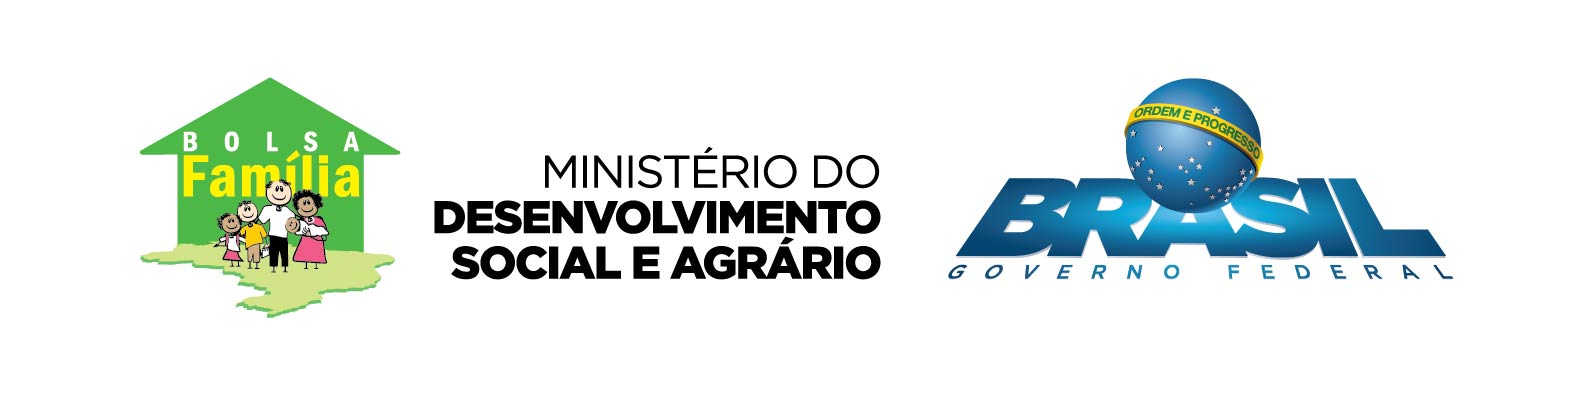 Beneficiários Programa Bolsa Família - JANEIRO 2019